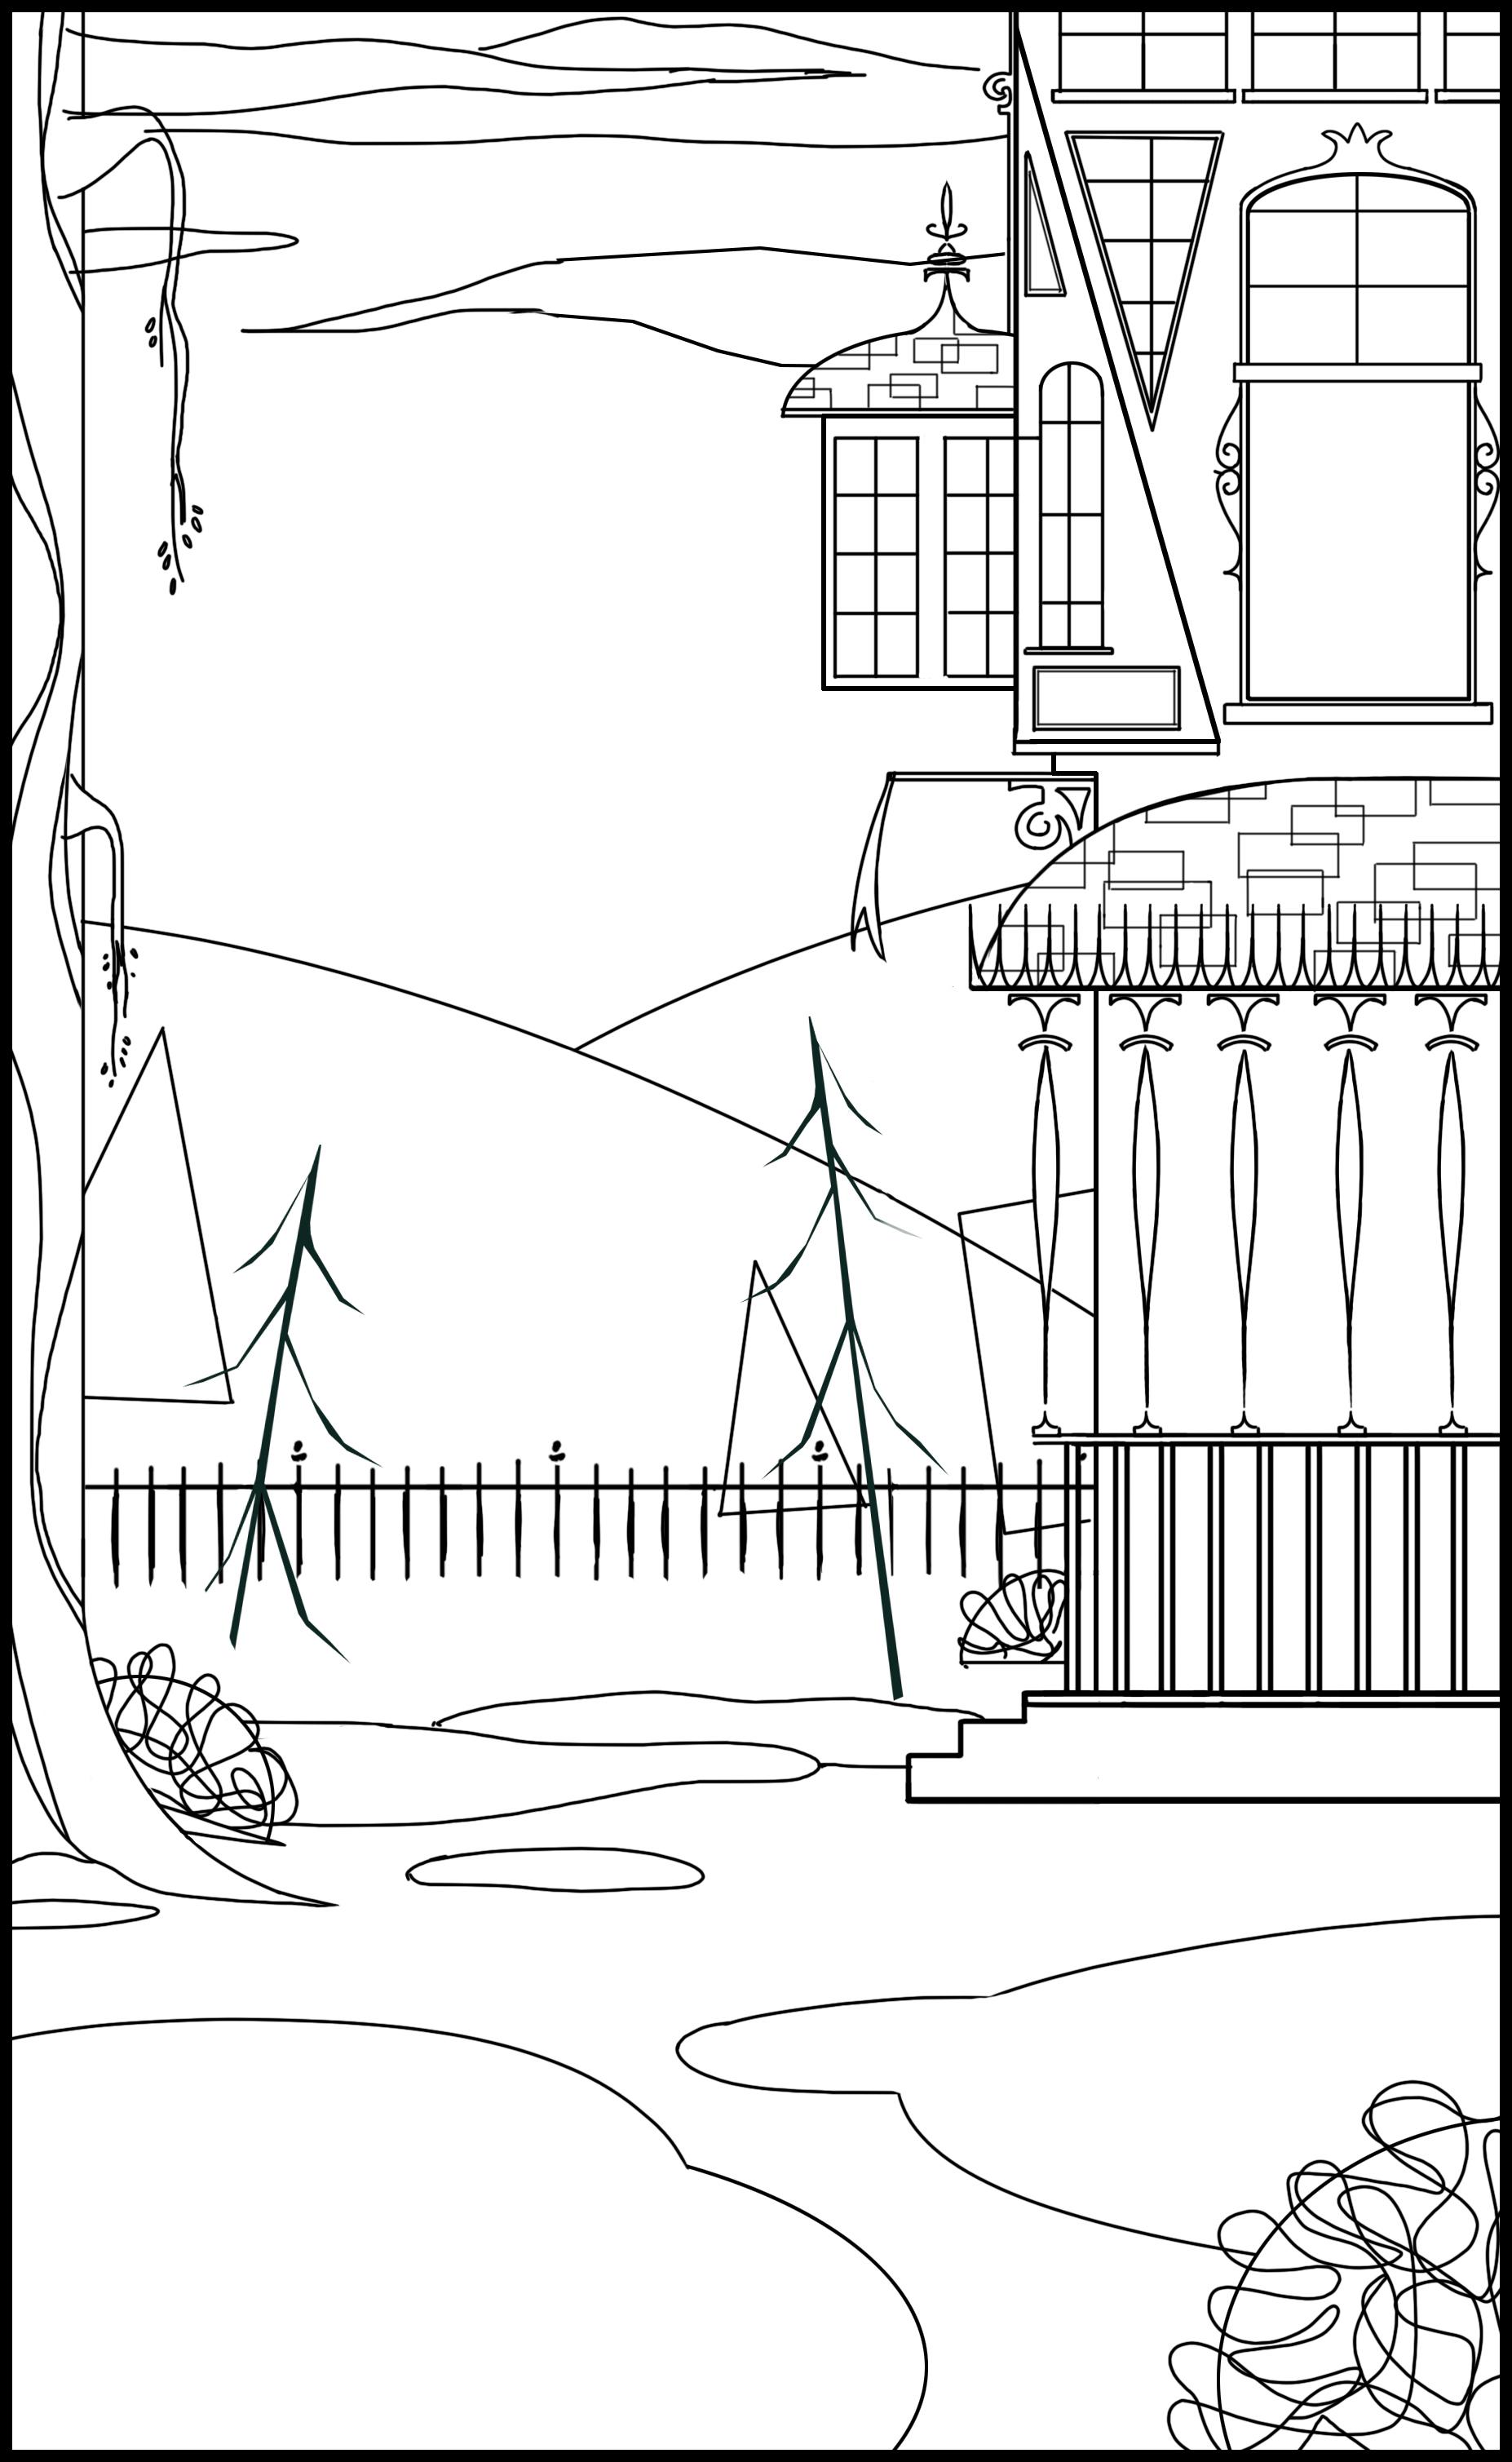 layout2.jpg